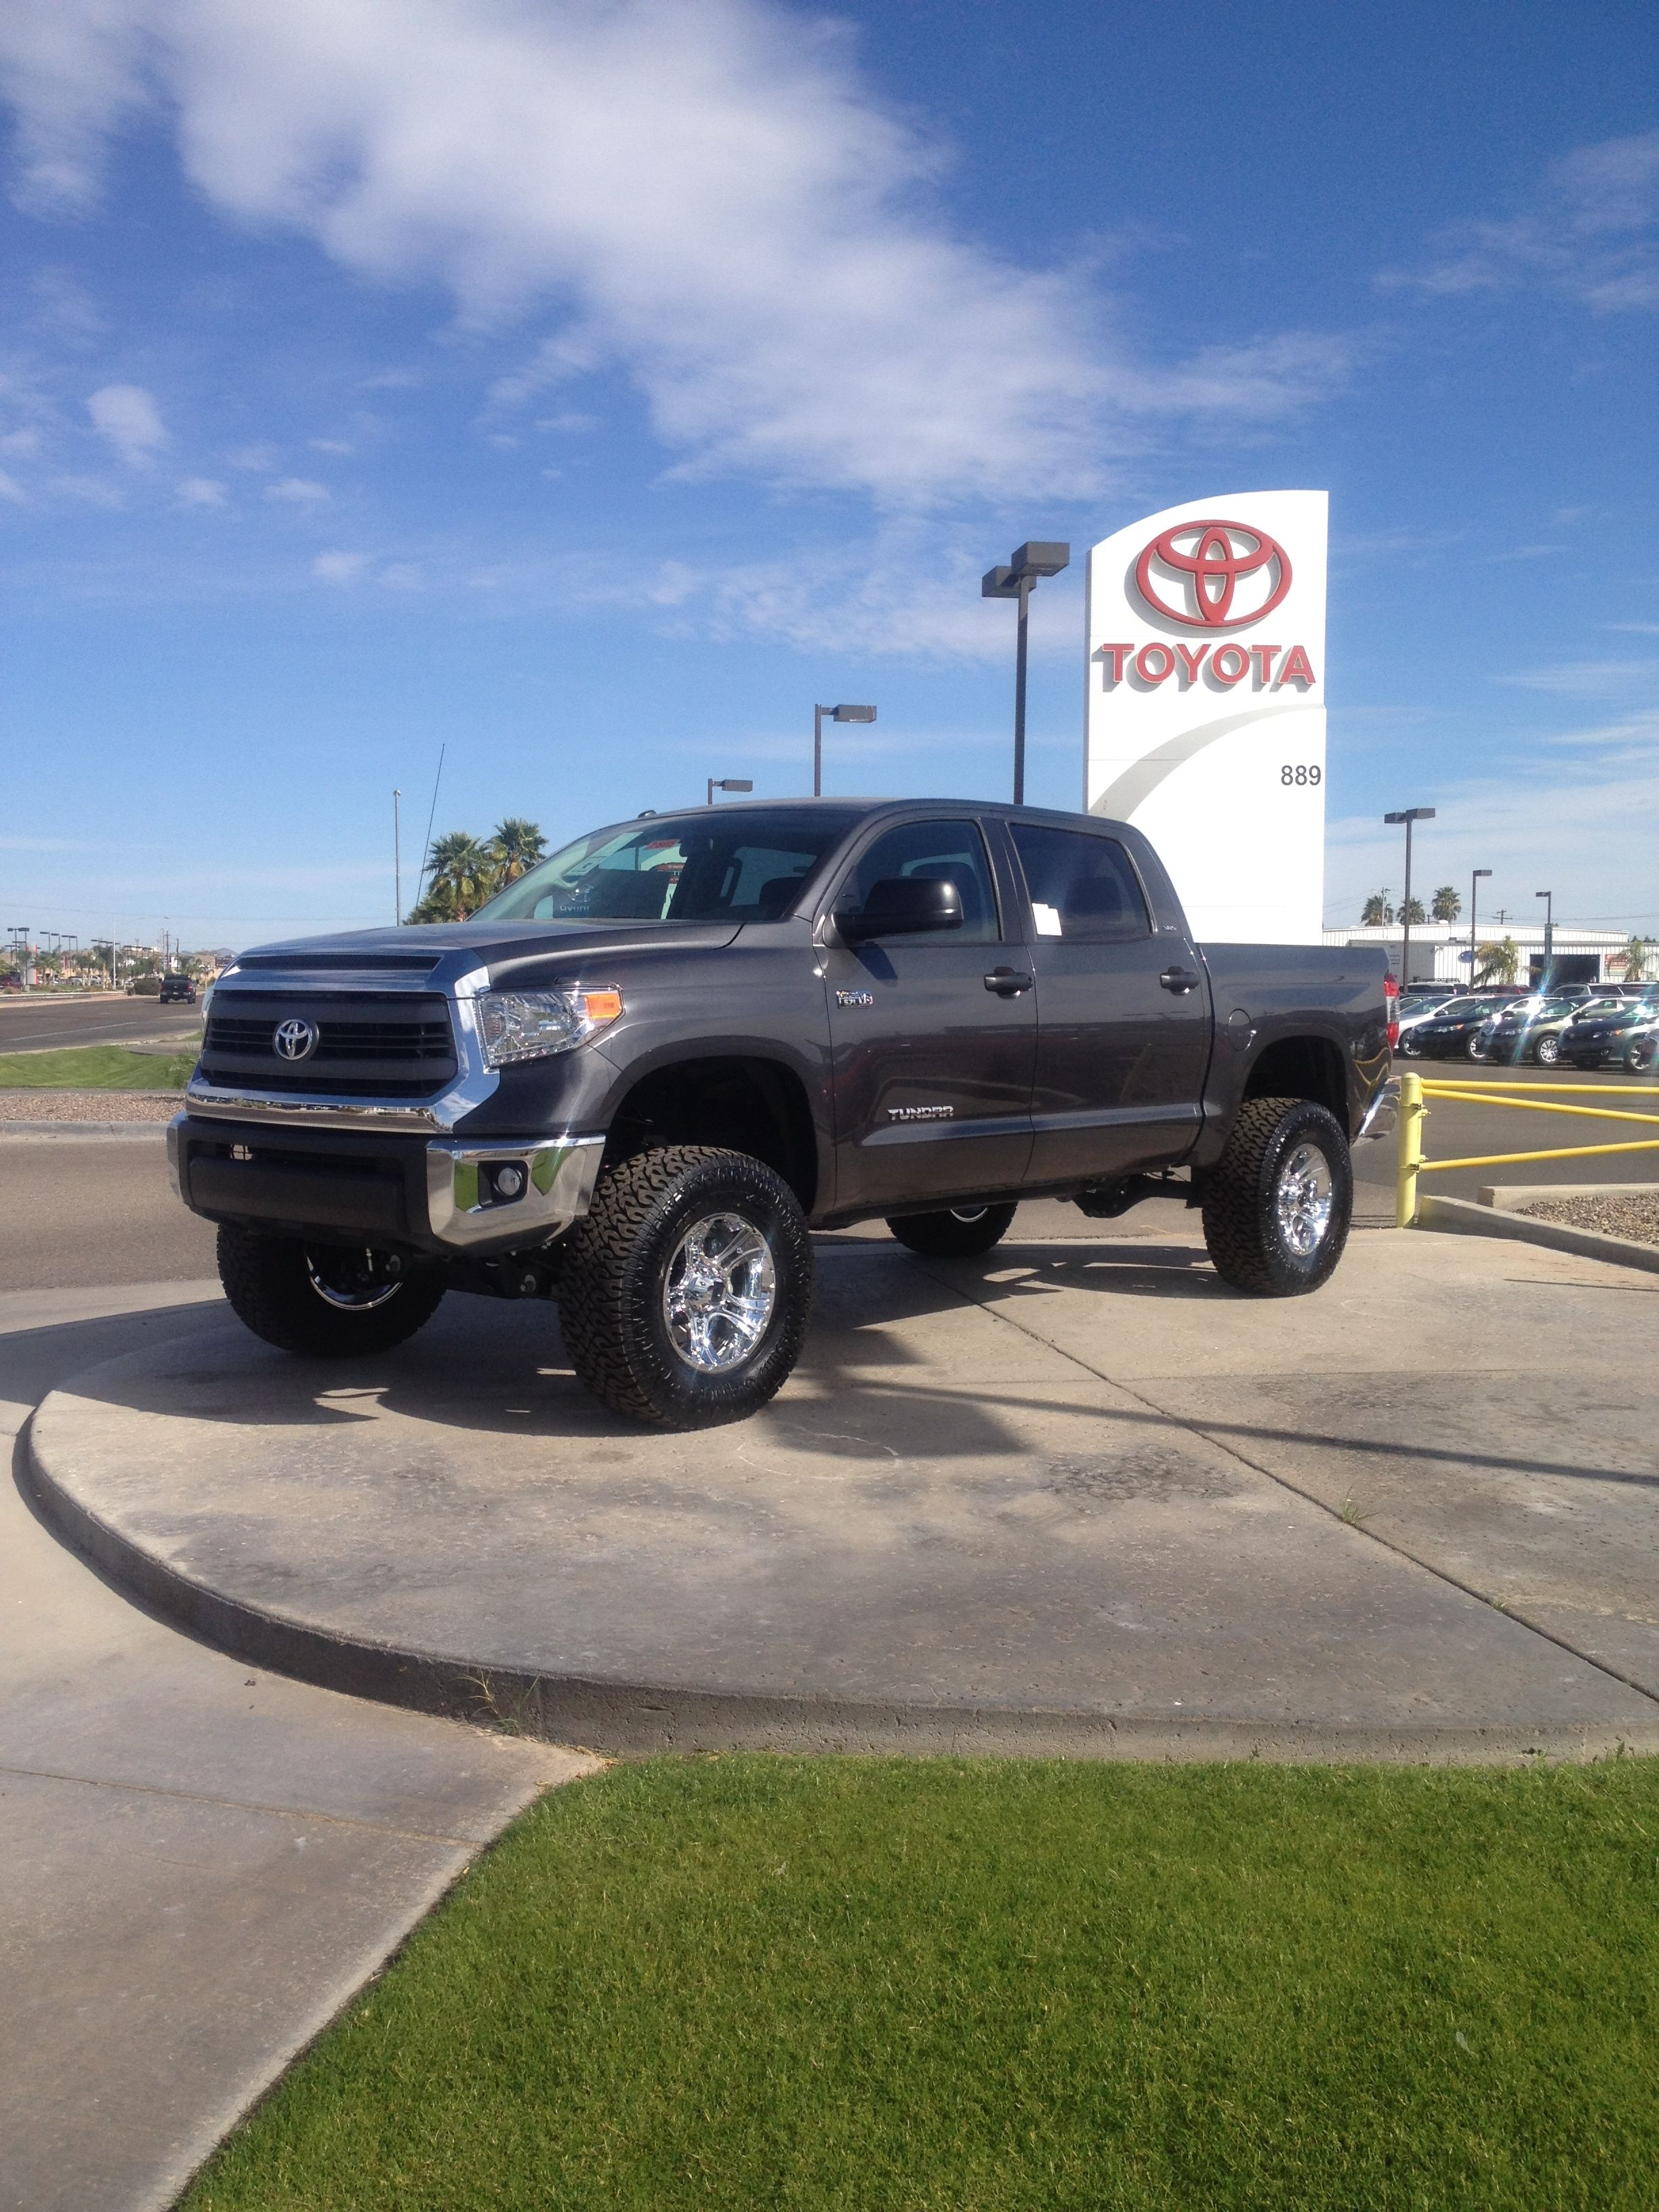 2014 Tundra Off Road | Autos Post